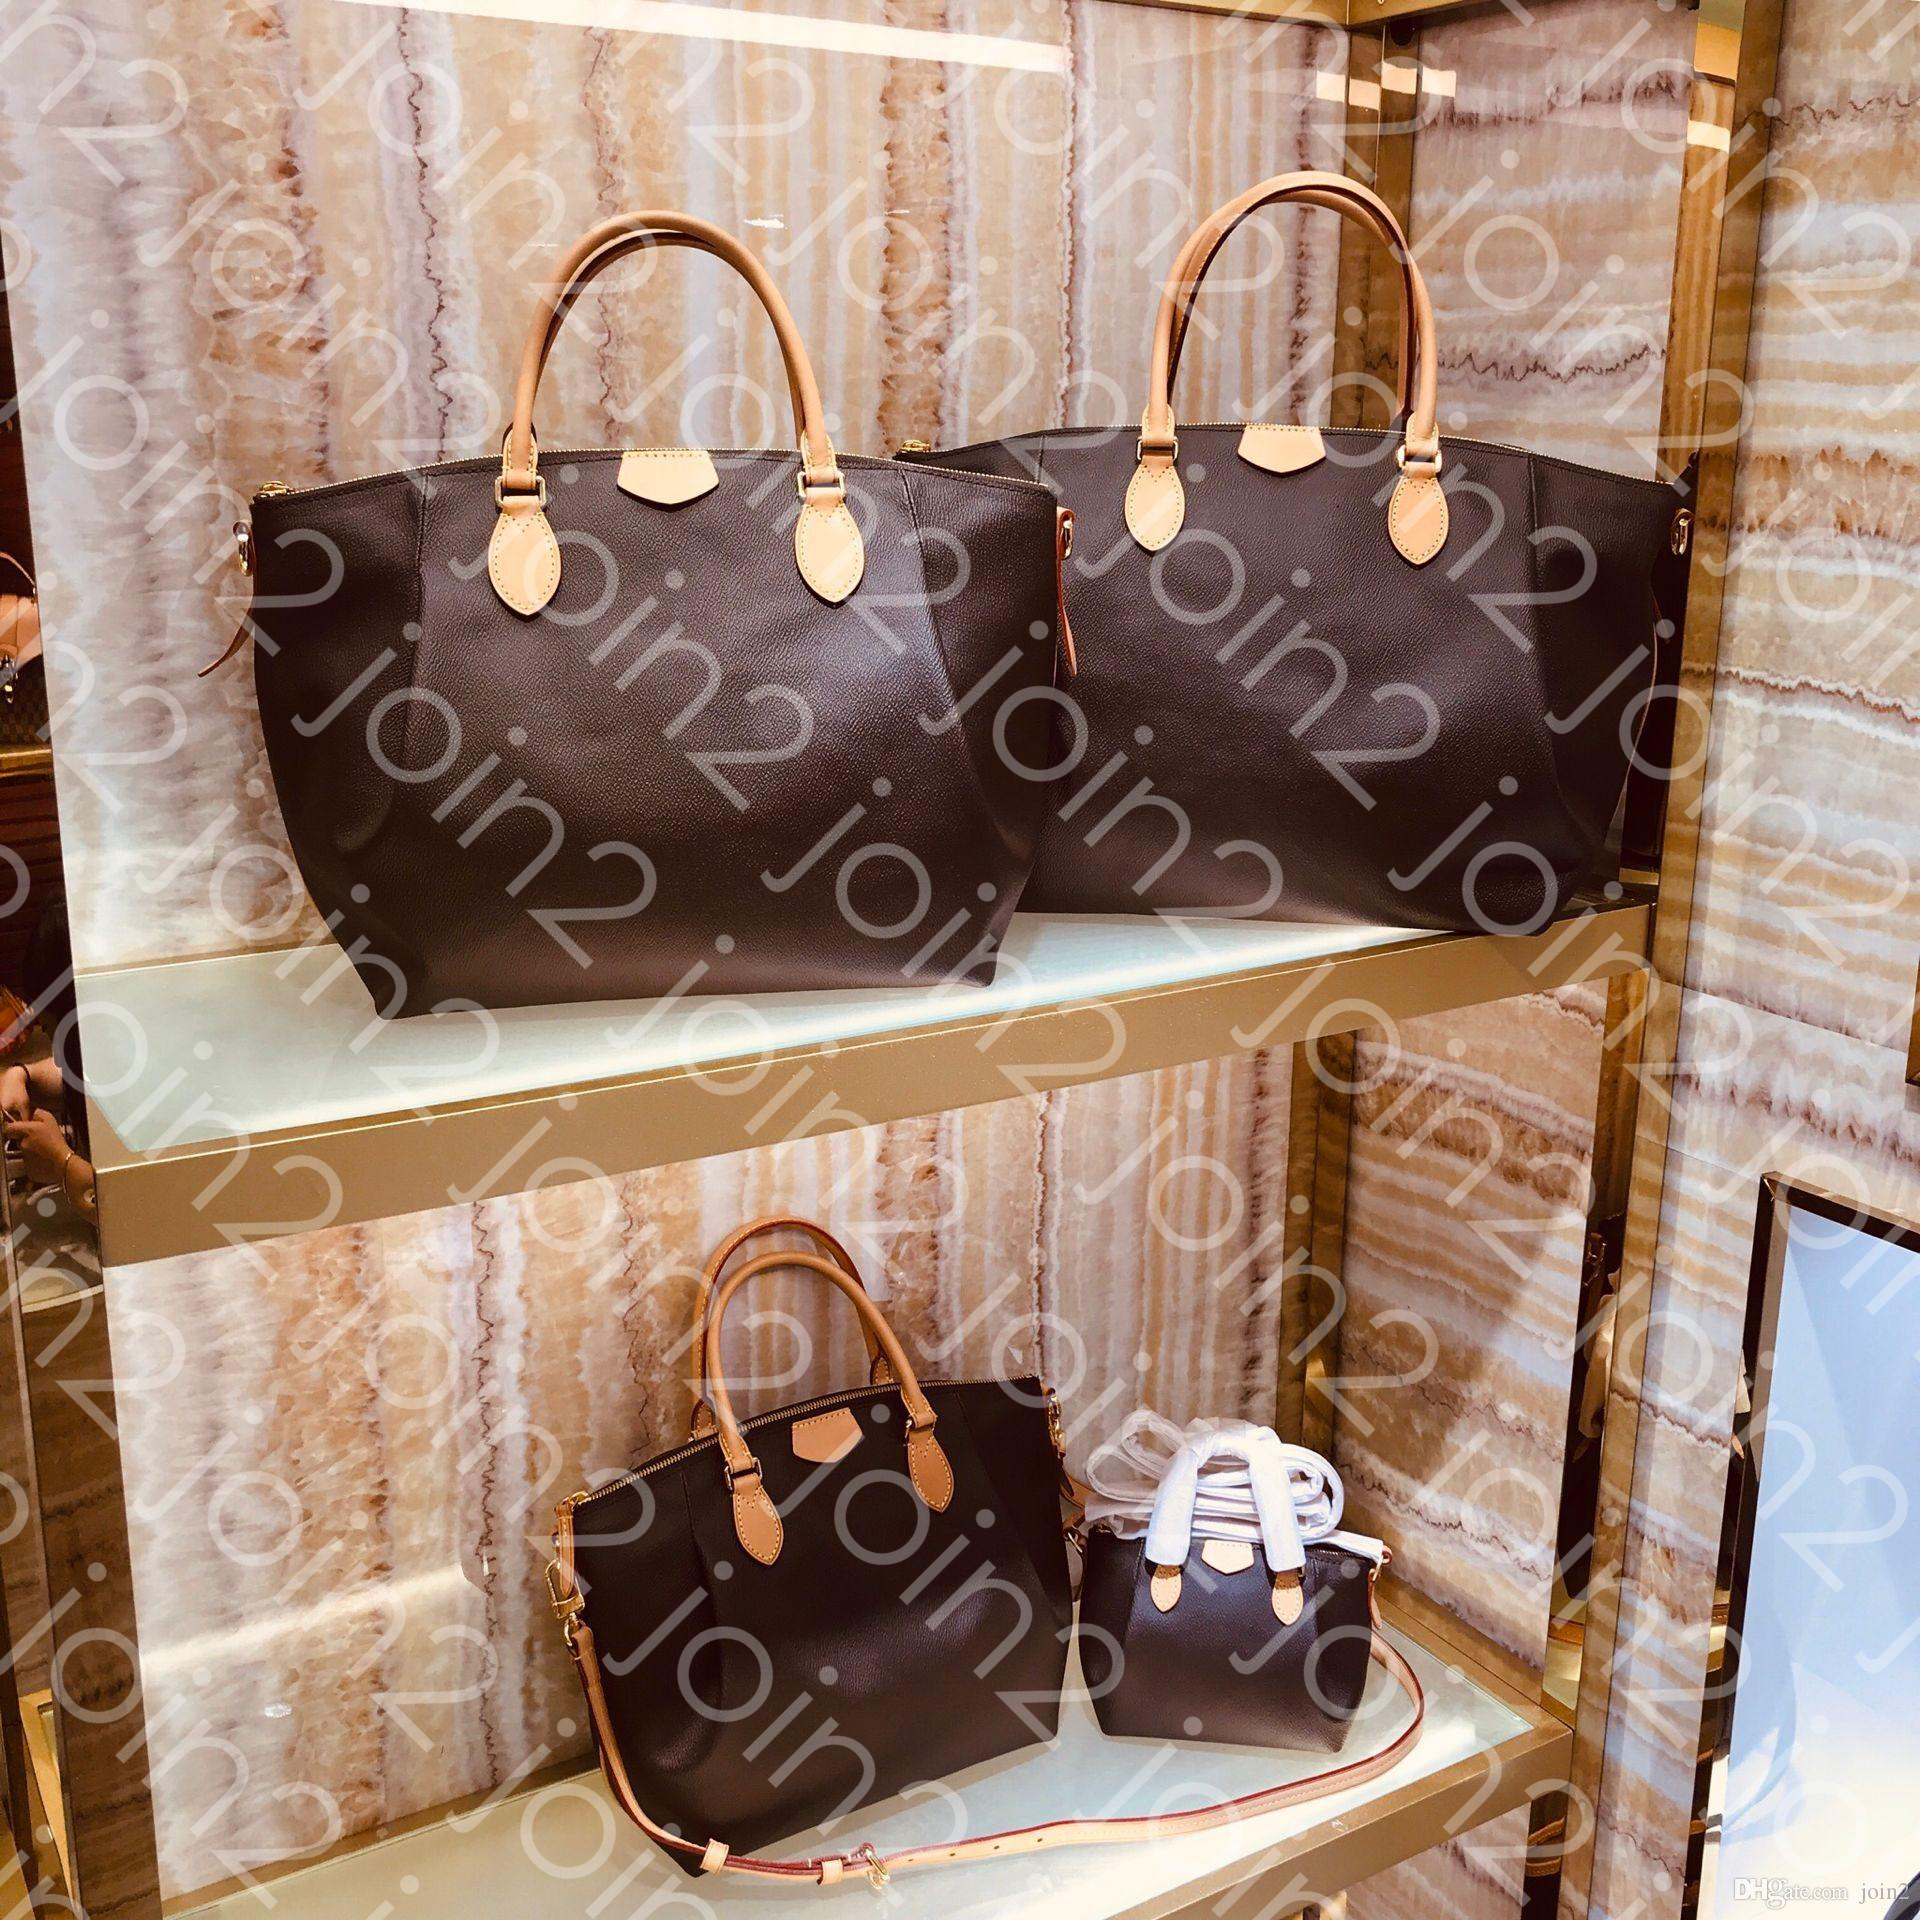 TURENNE MM PM Moda de alta calidad para mujer Mini bandolera Marrón Impermeable Lona con estilo Totalizador Mango superior Nano Cross Body Bag GM M48814